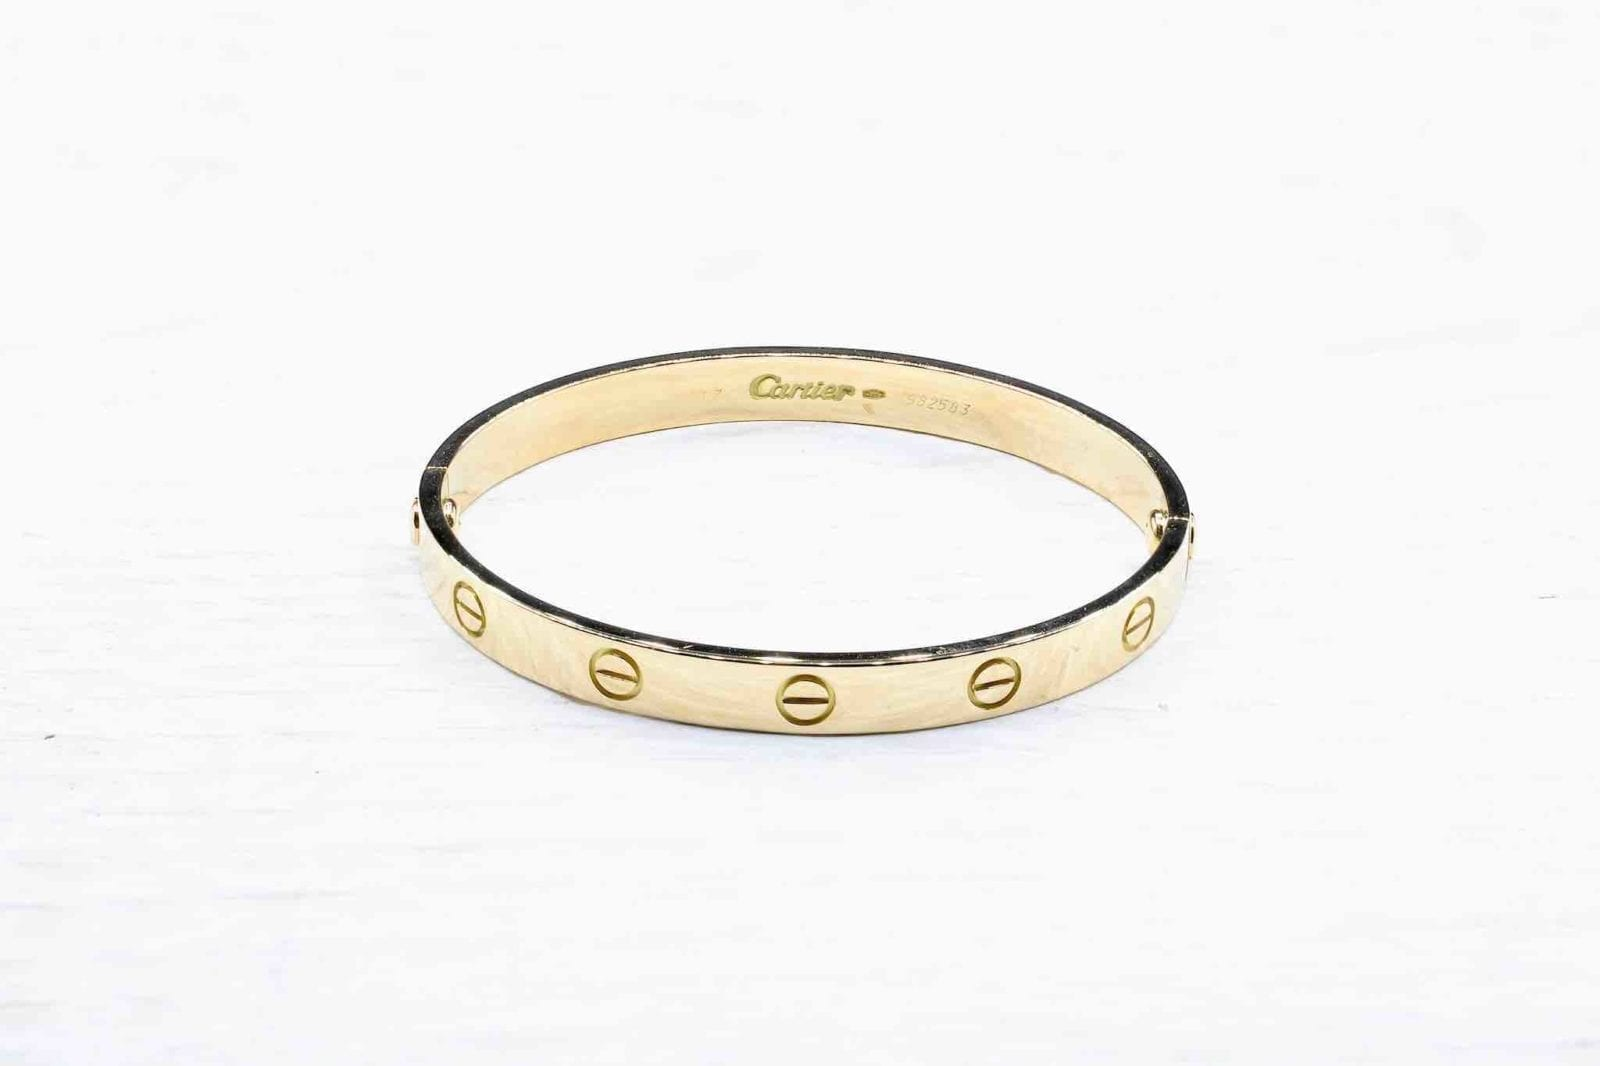 Bracelet Cartier Love en or jaune 18k